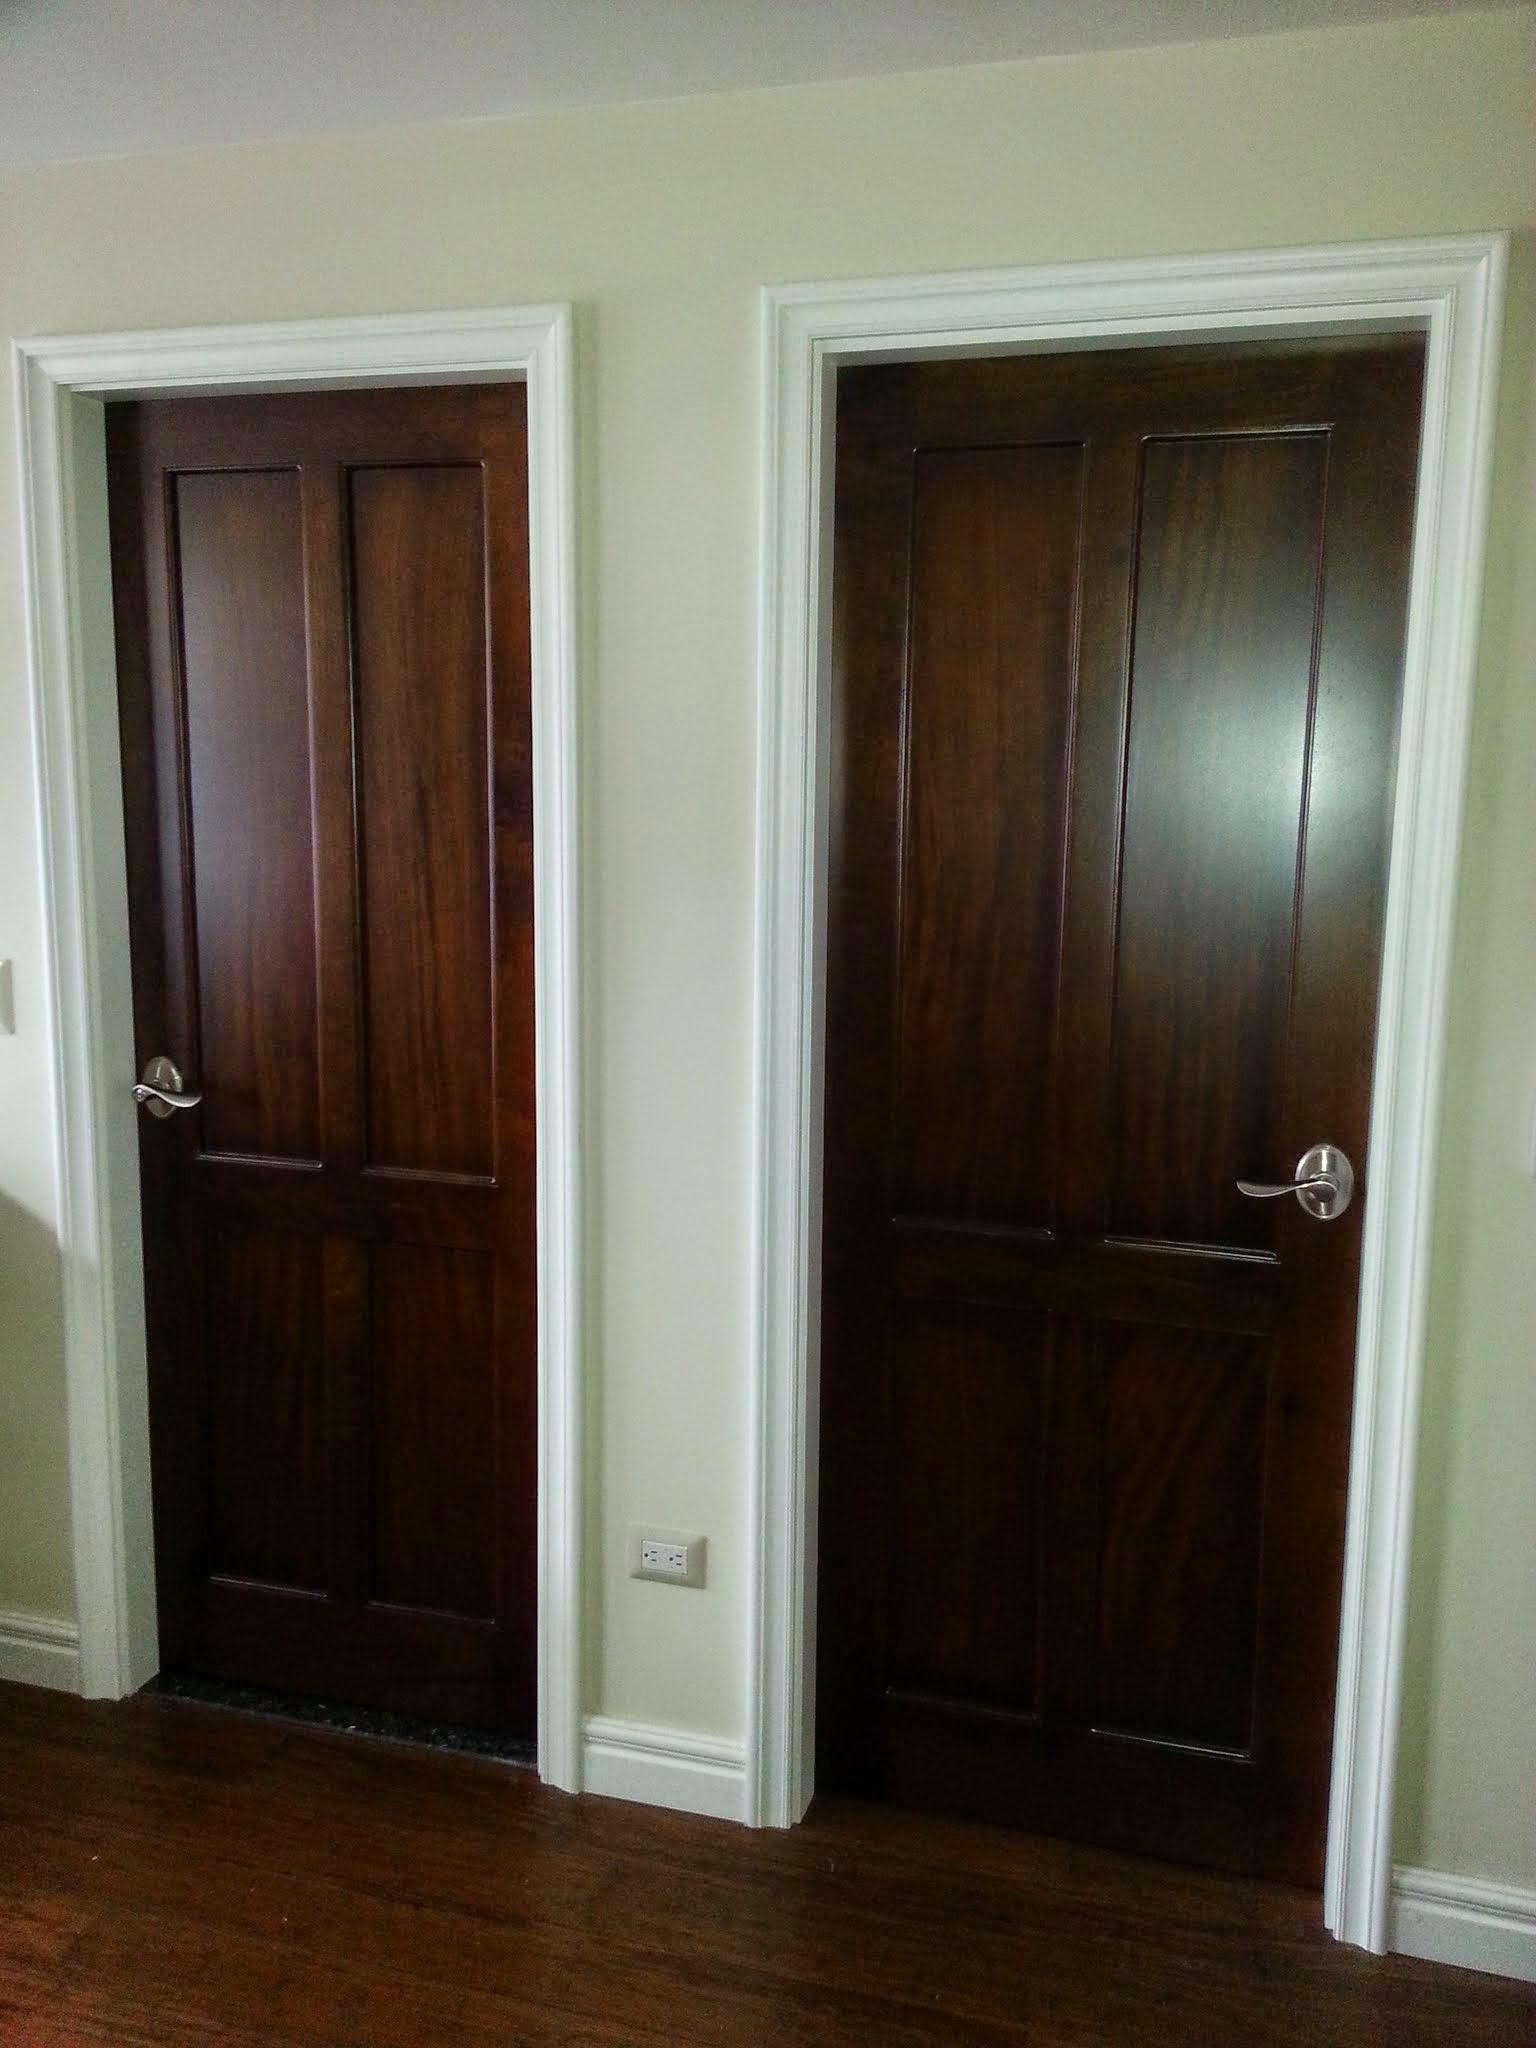 Wood furniture door Pooja Room Furniture Doors Photo Gallery Amish Cabinet Doors Wood Doors Custom Furniture Fine Furniture Of Sarchí